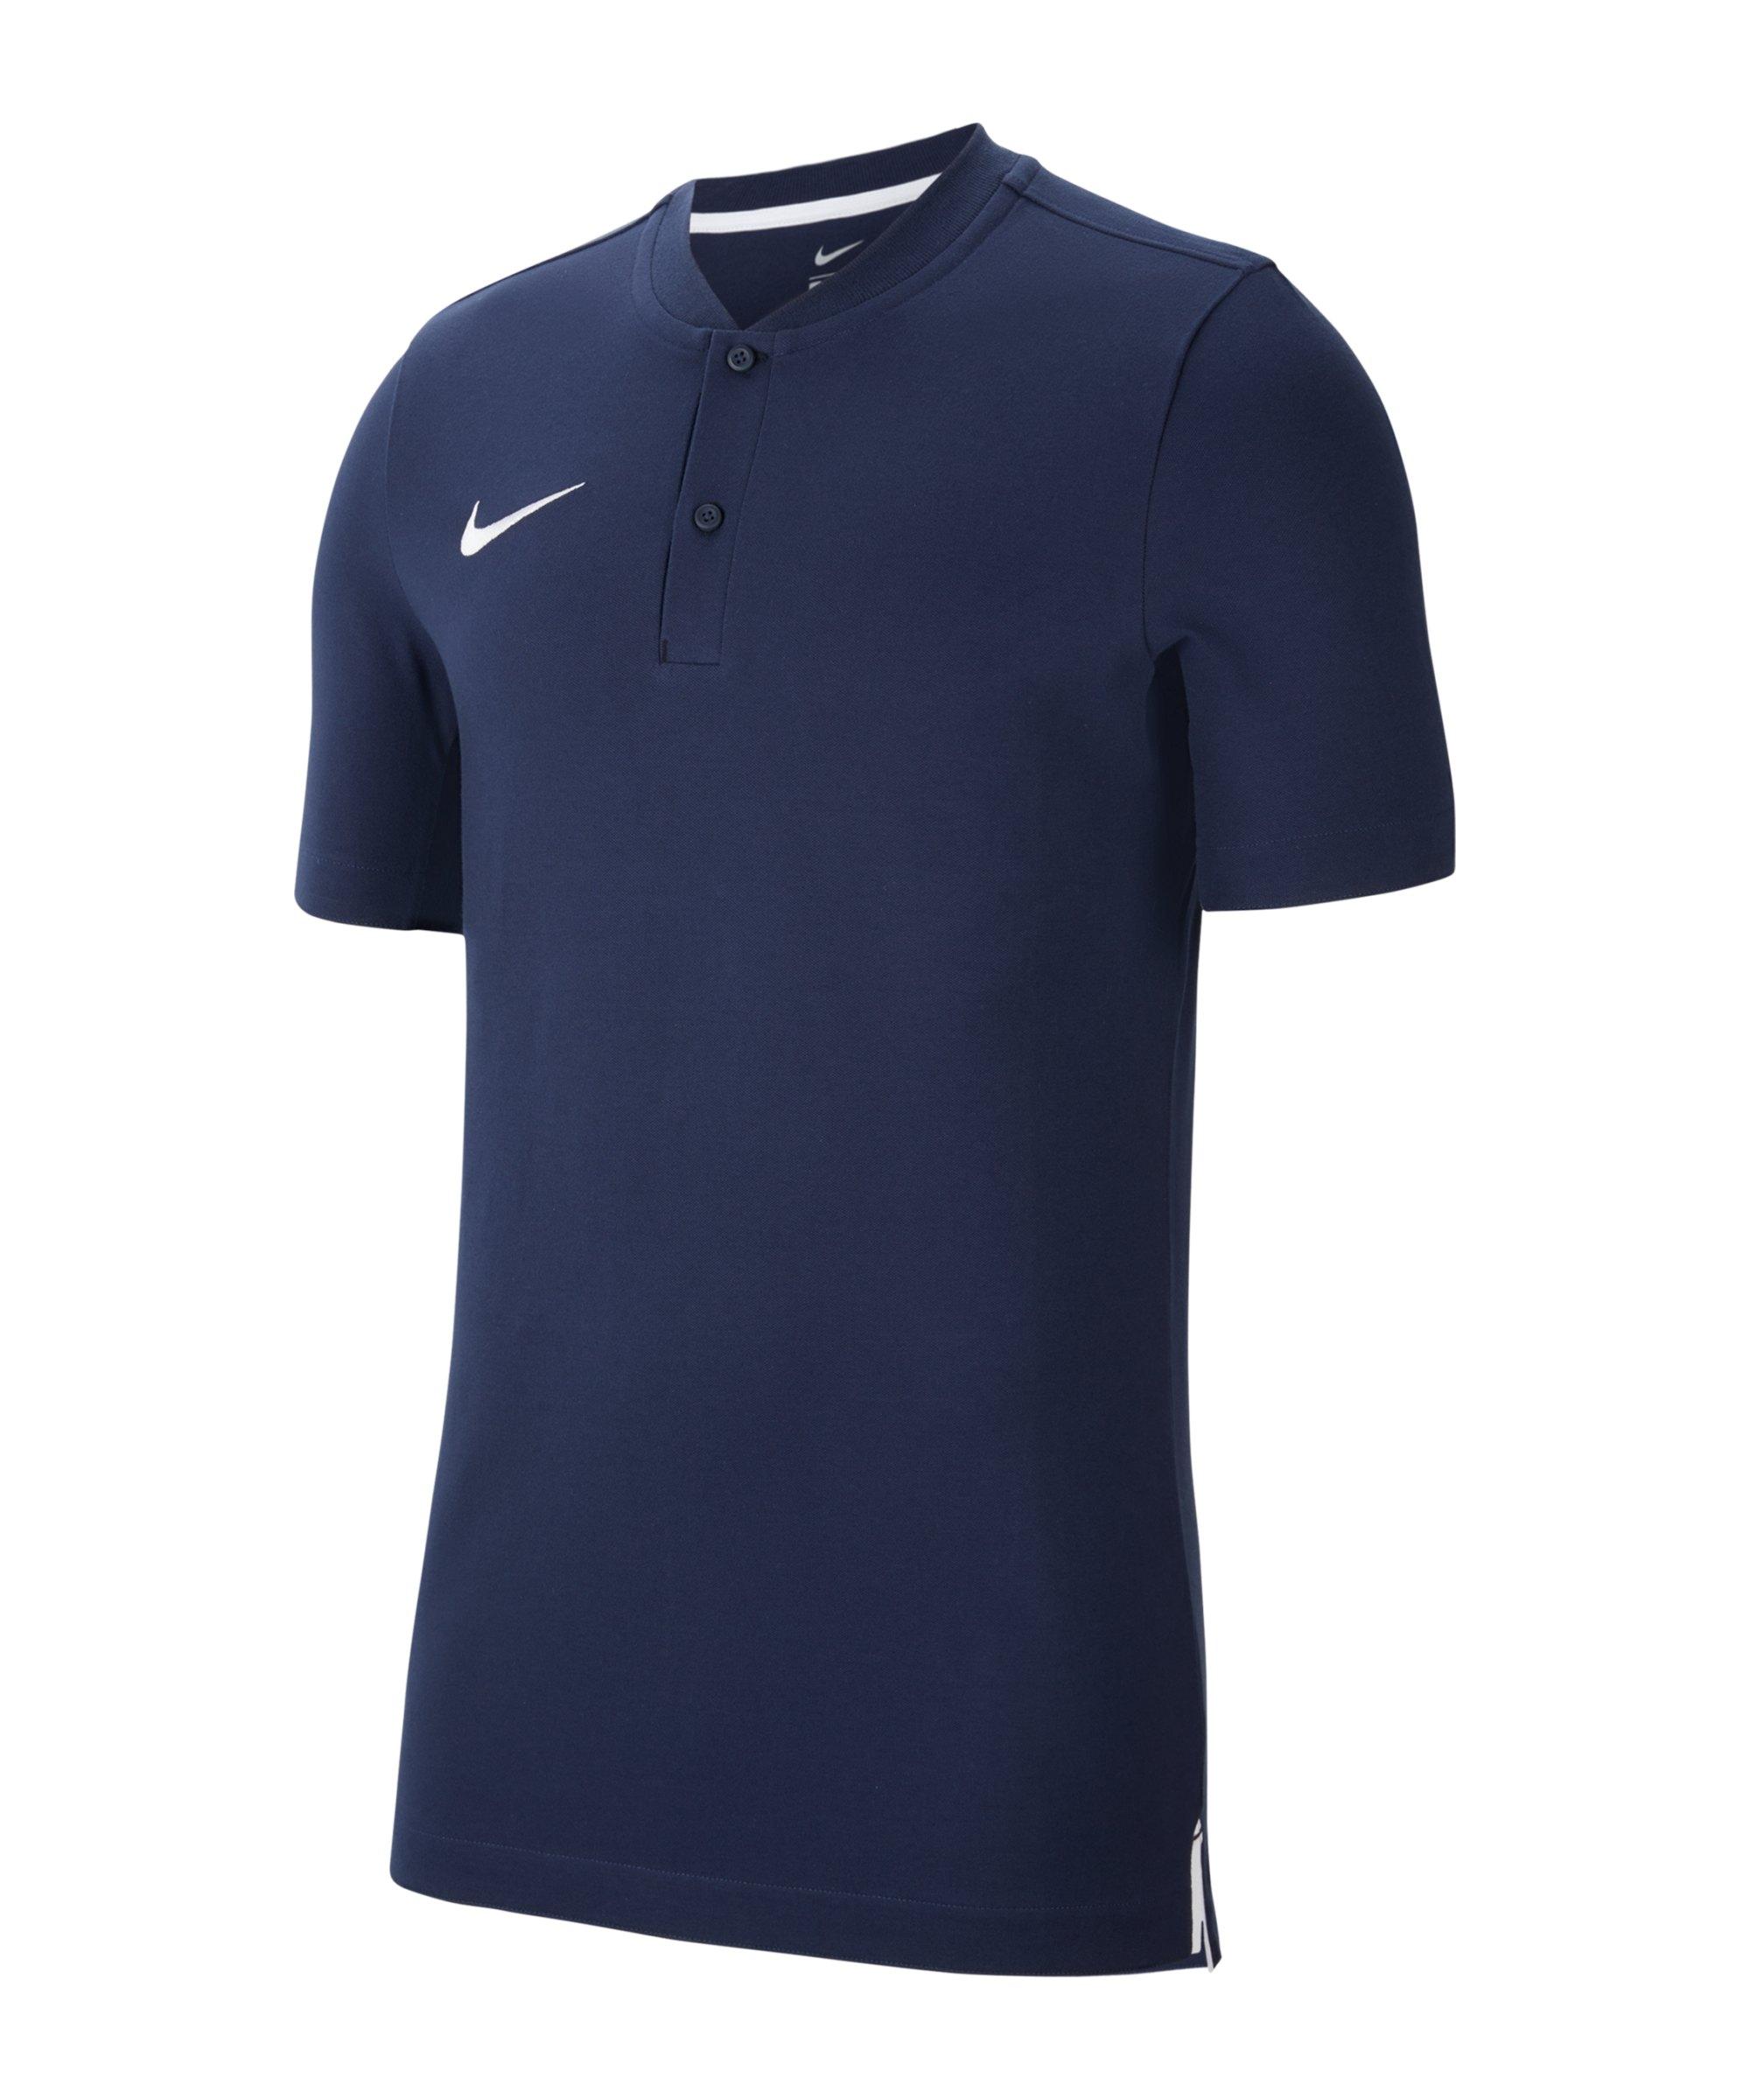 Nike Strike Poloshirt Blau Weiss F451 - blau